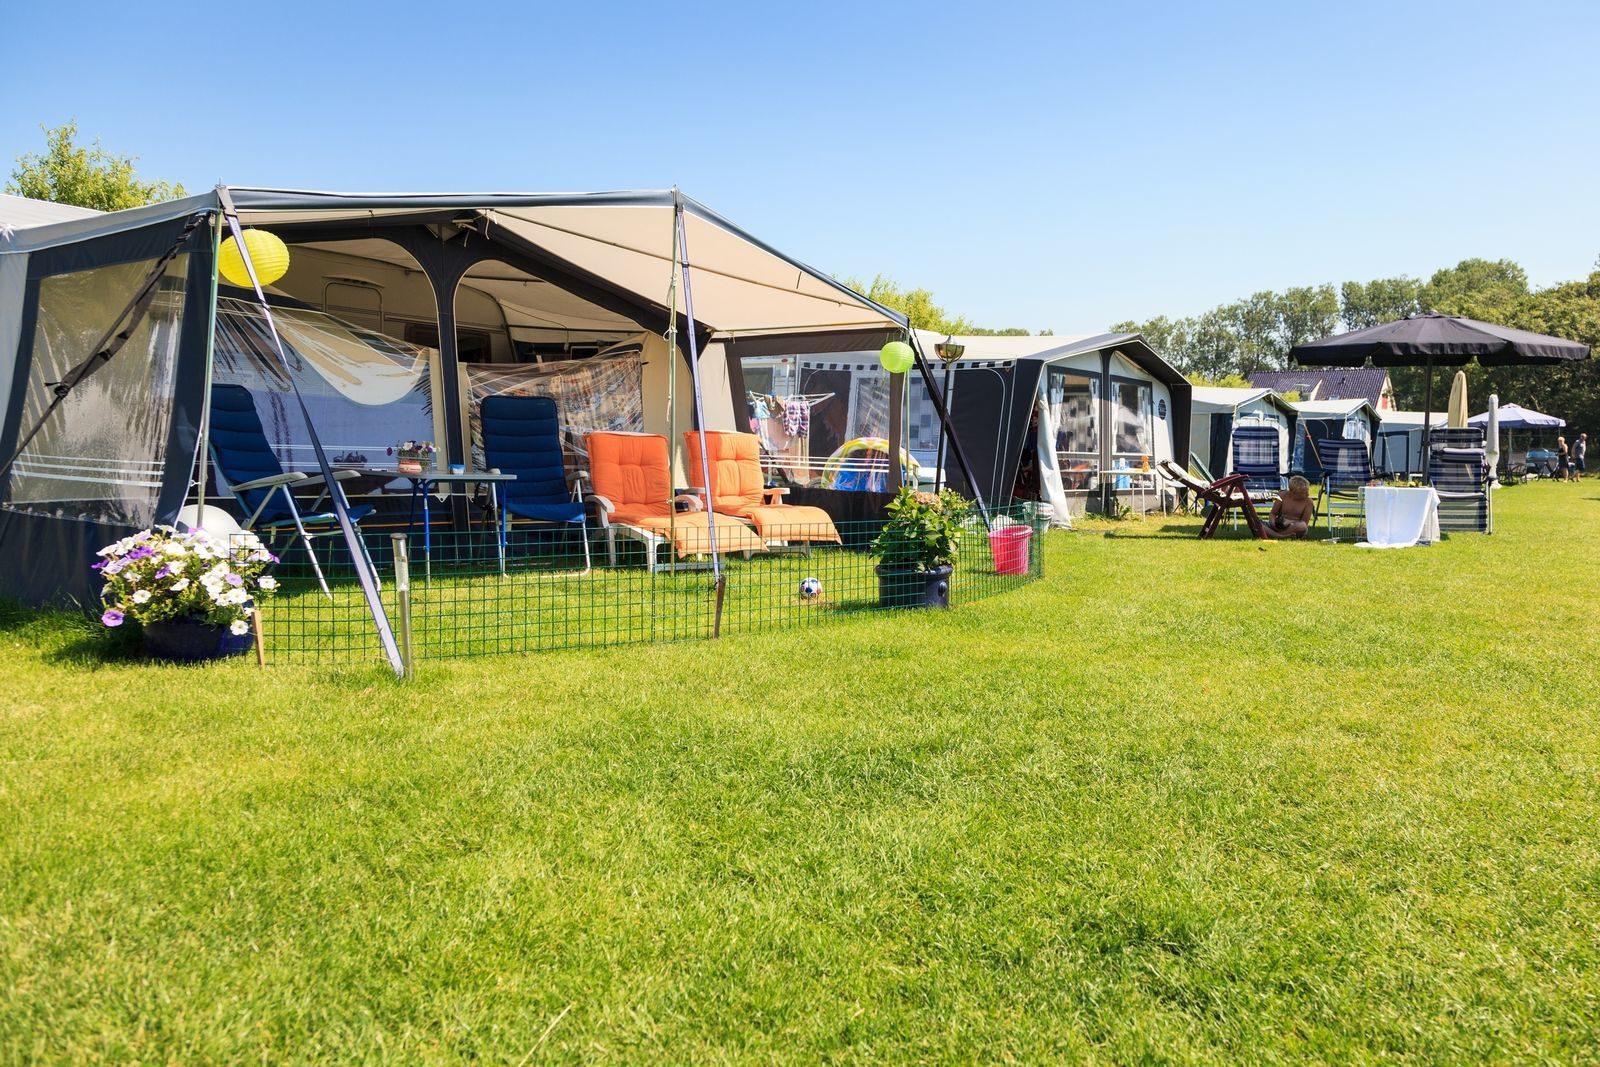 Camping Ferienpark 't Gelloo